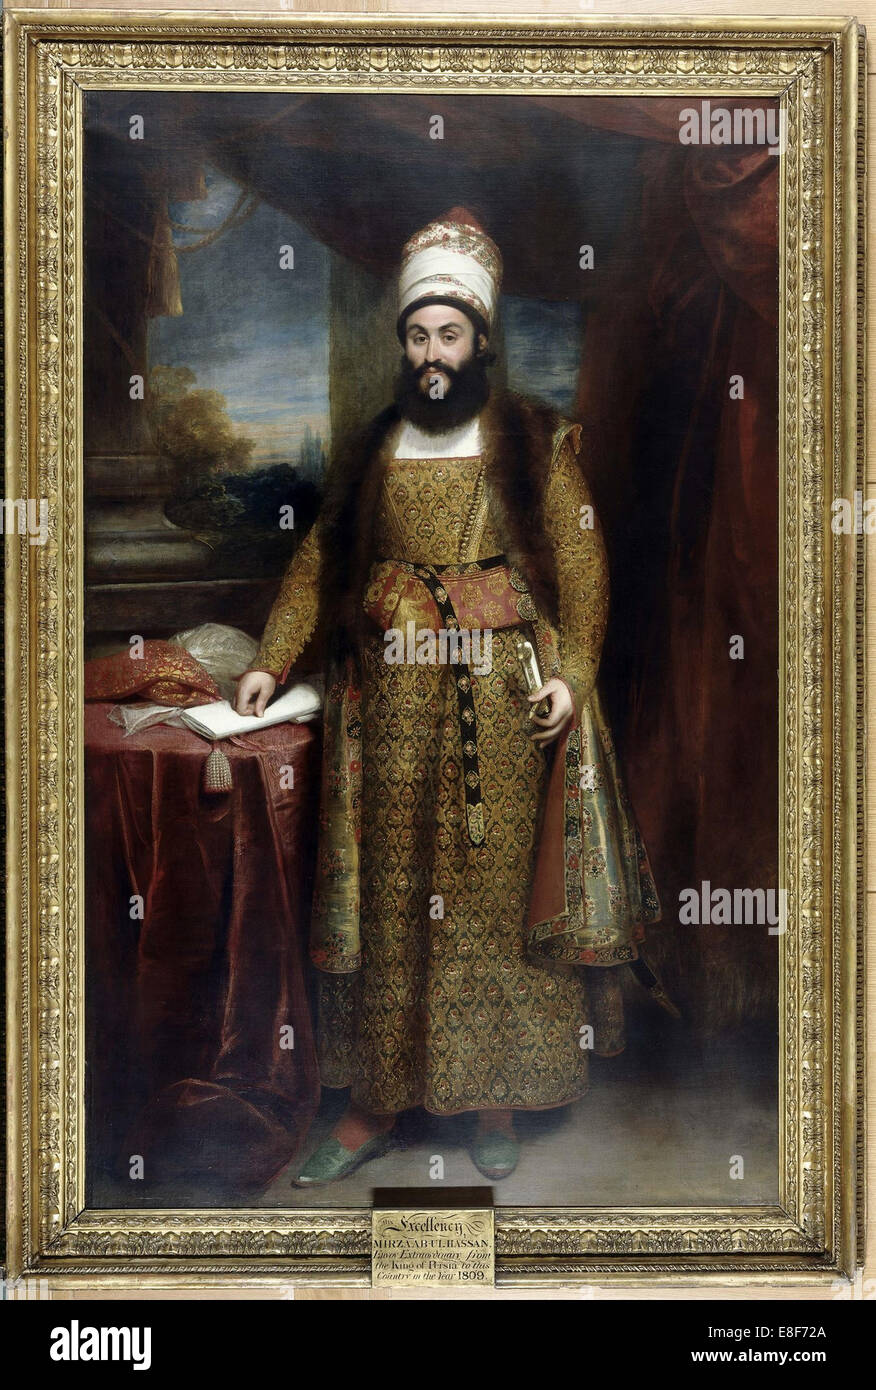 Portrait of Mirza Abul Hasan Khan Ilchi (1776-1846). Artist: Beechey, Sir William (1753-1839) - Stock Image